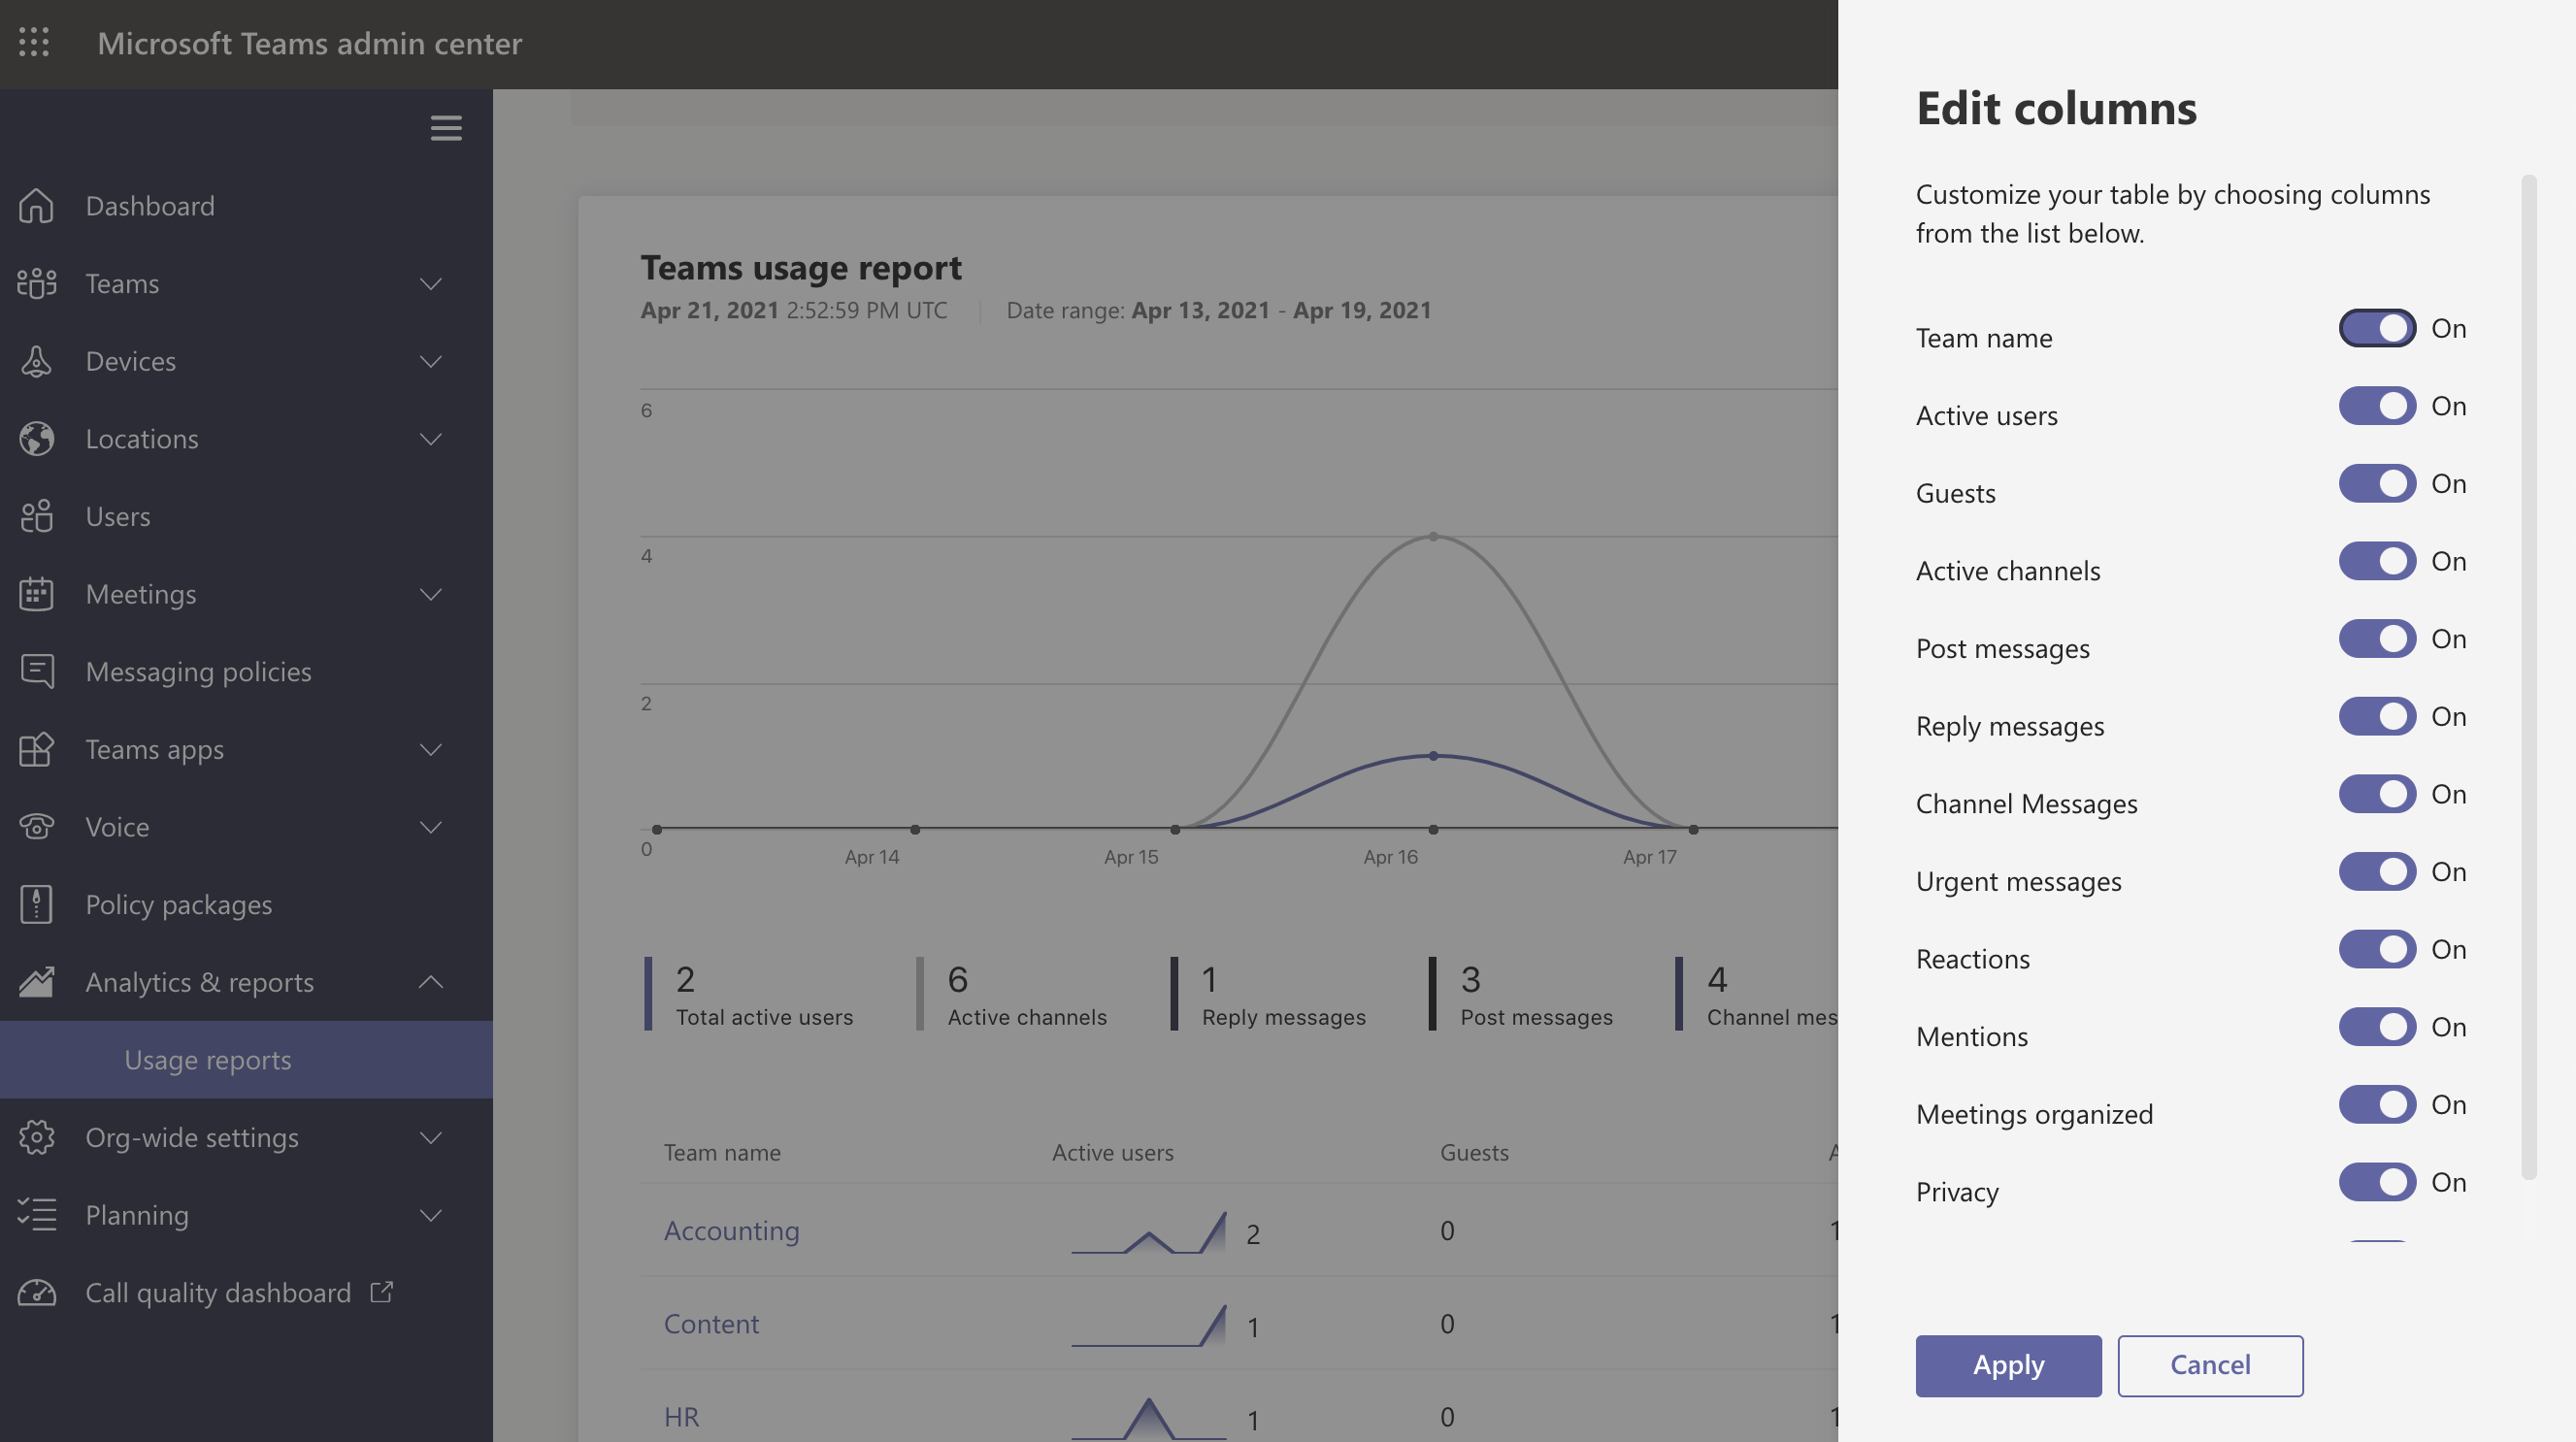 Screenshot of the Edit columns pane in Teams admin center